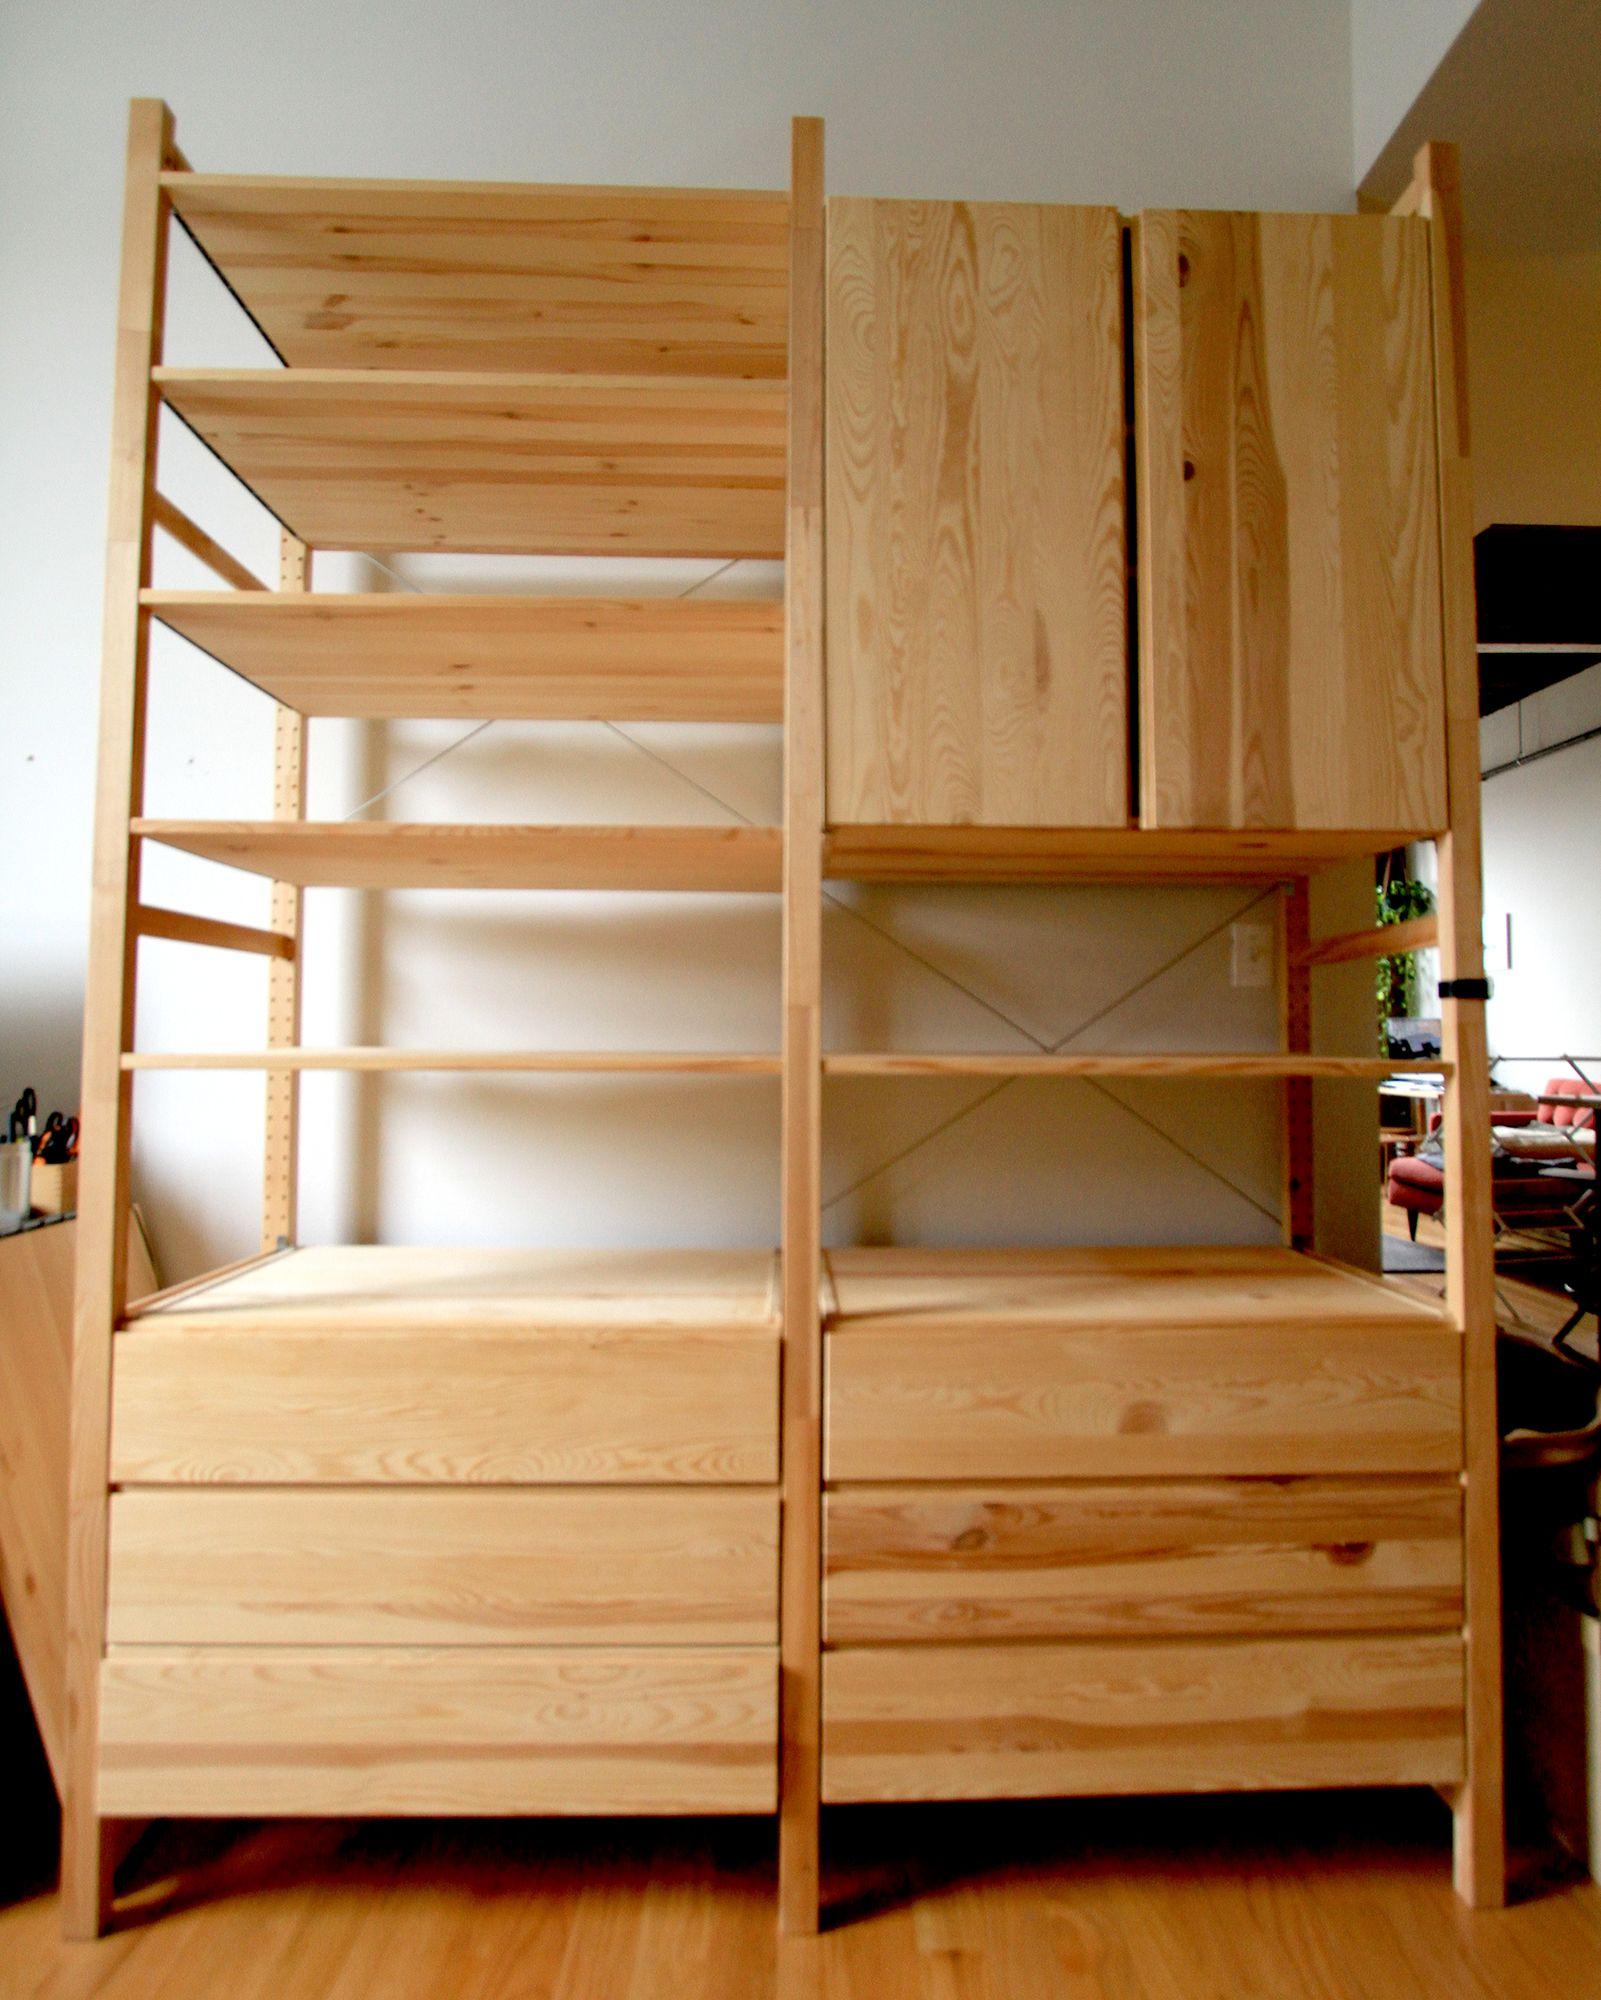 Ikea Ivar Storage System In 2020 Wohnzimmermobel Ikea Ikea